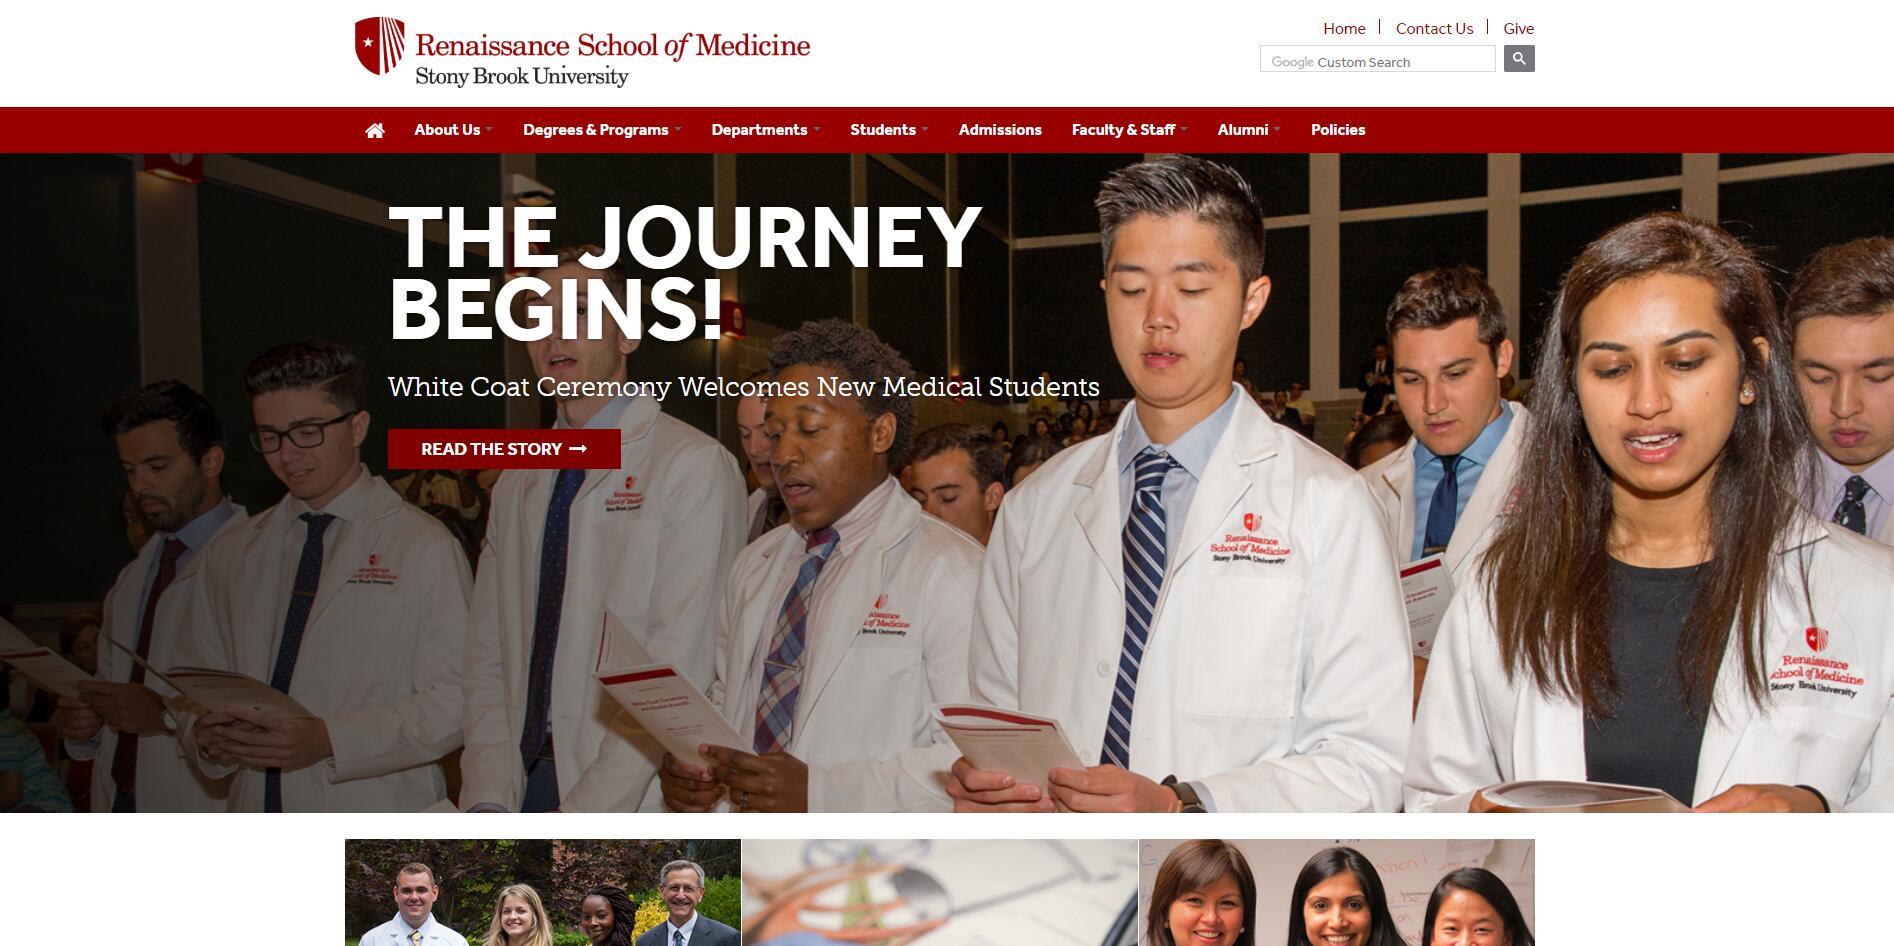 The School of Medicine at Stony Brook University--SUNY